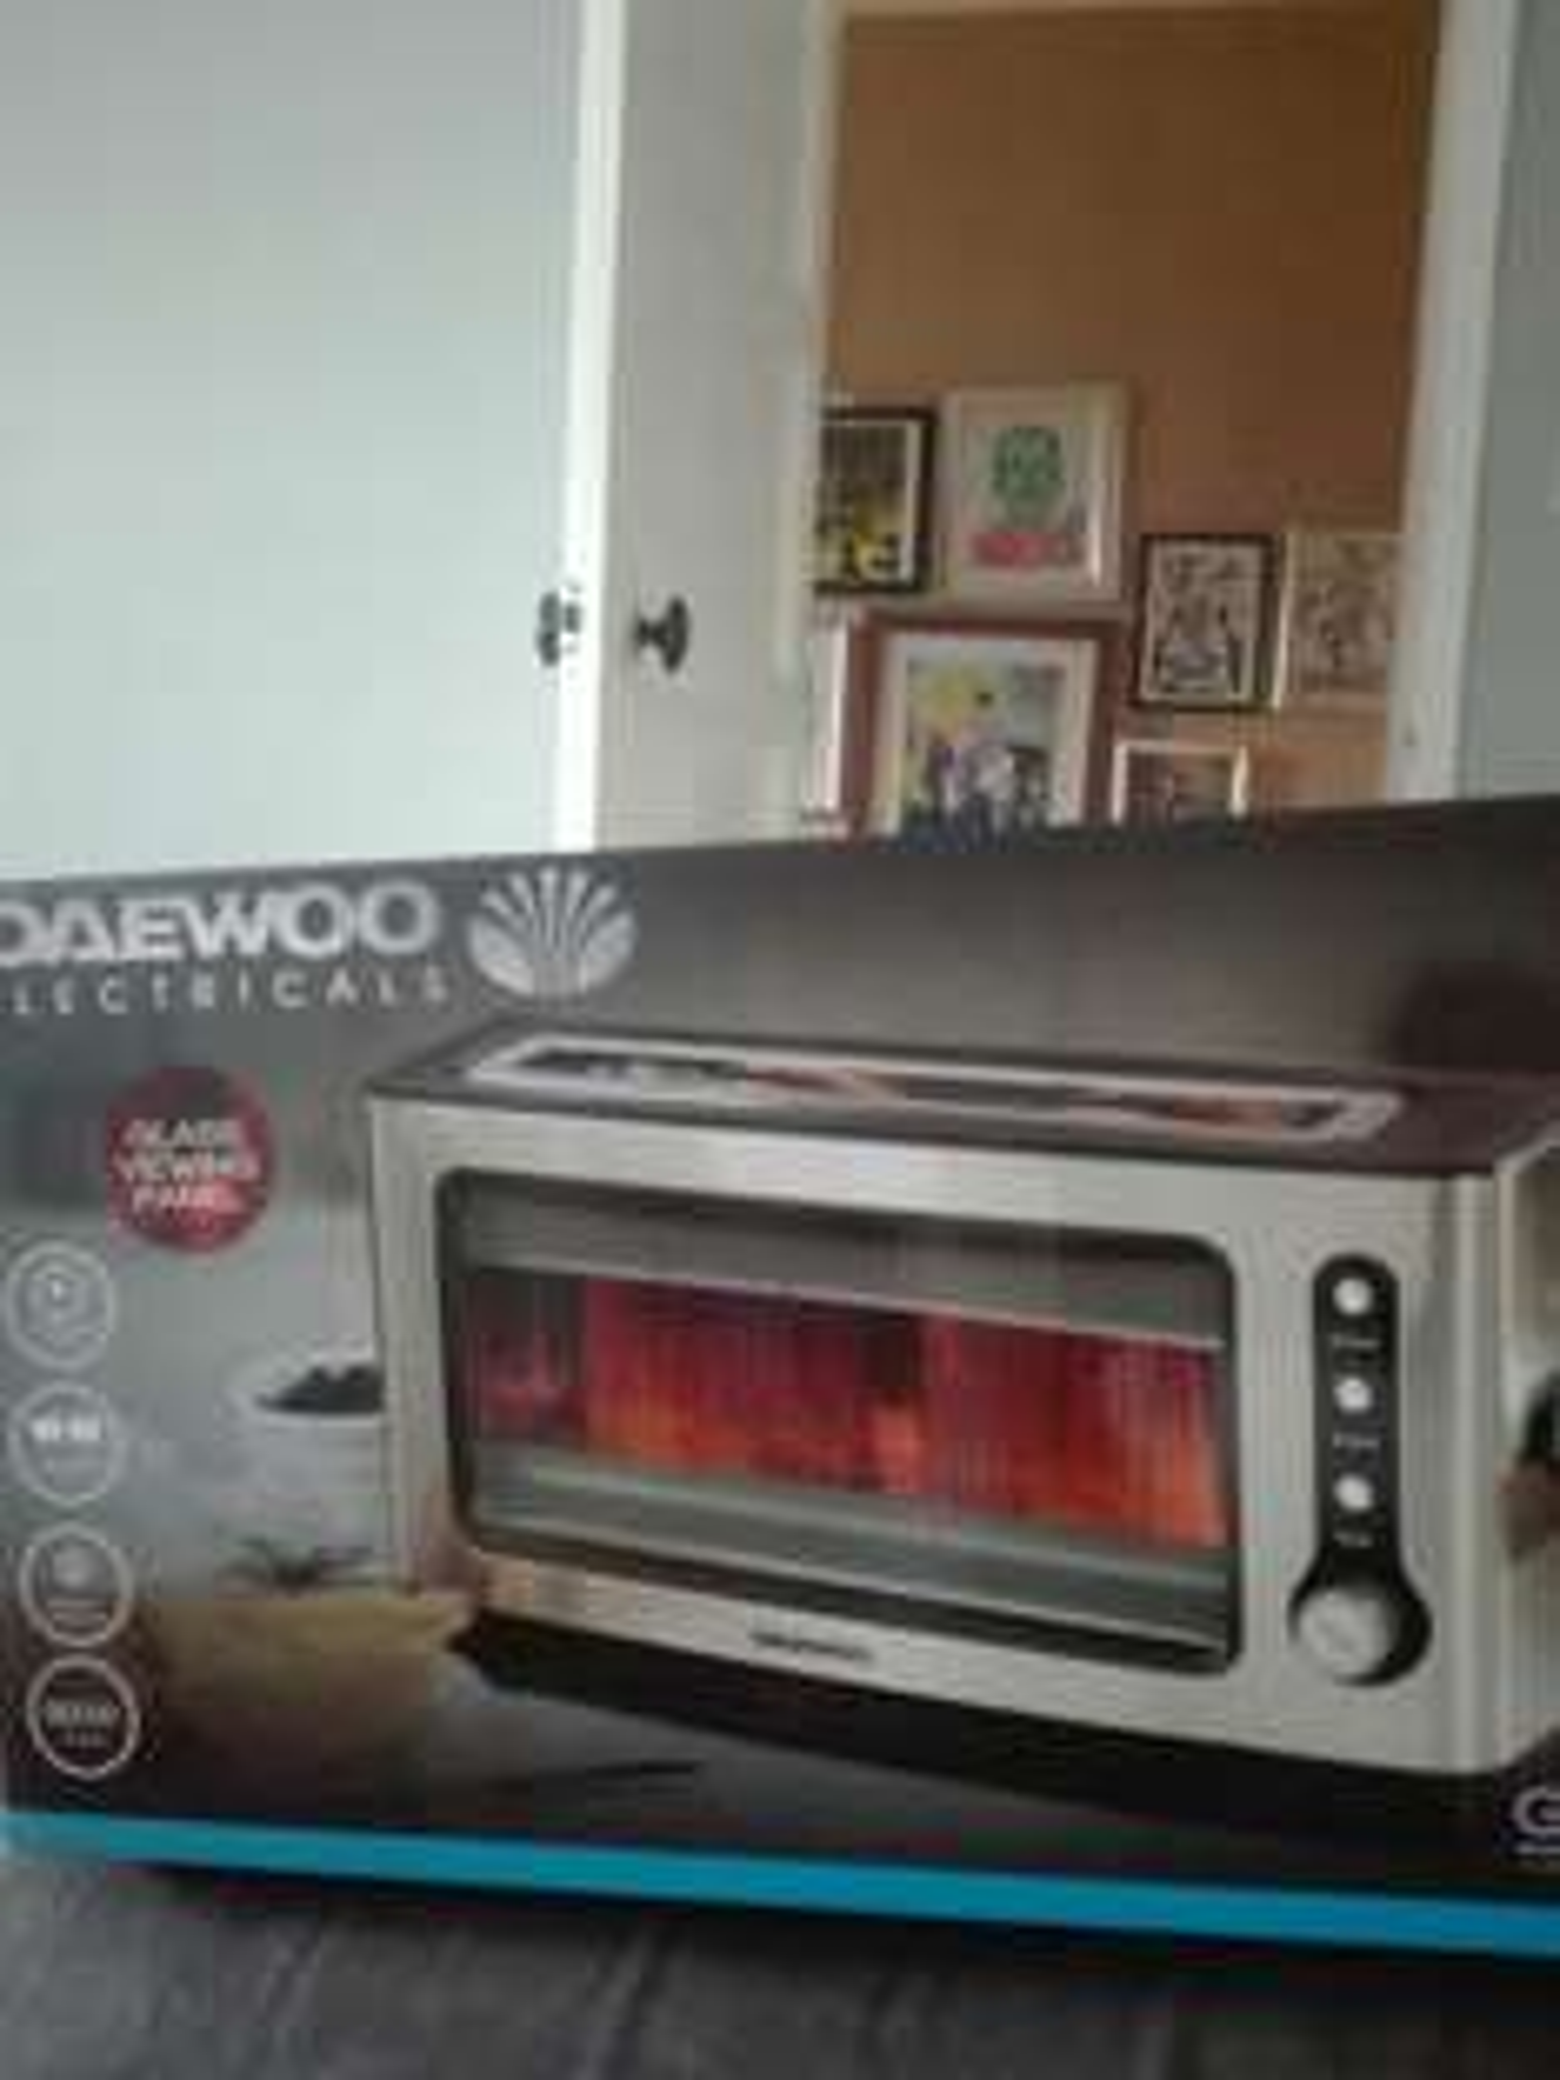 Daewoo see through glass toaster £14.99 @ B&M instore